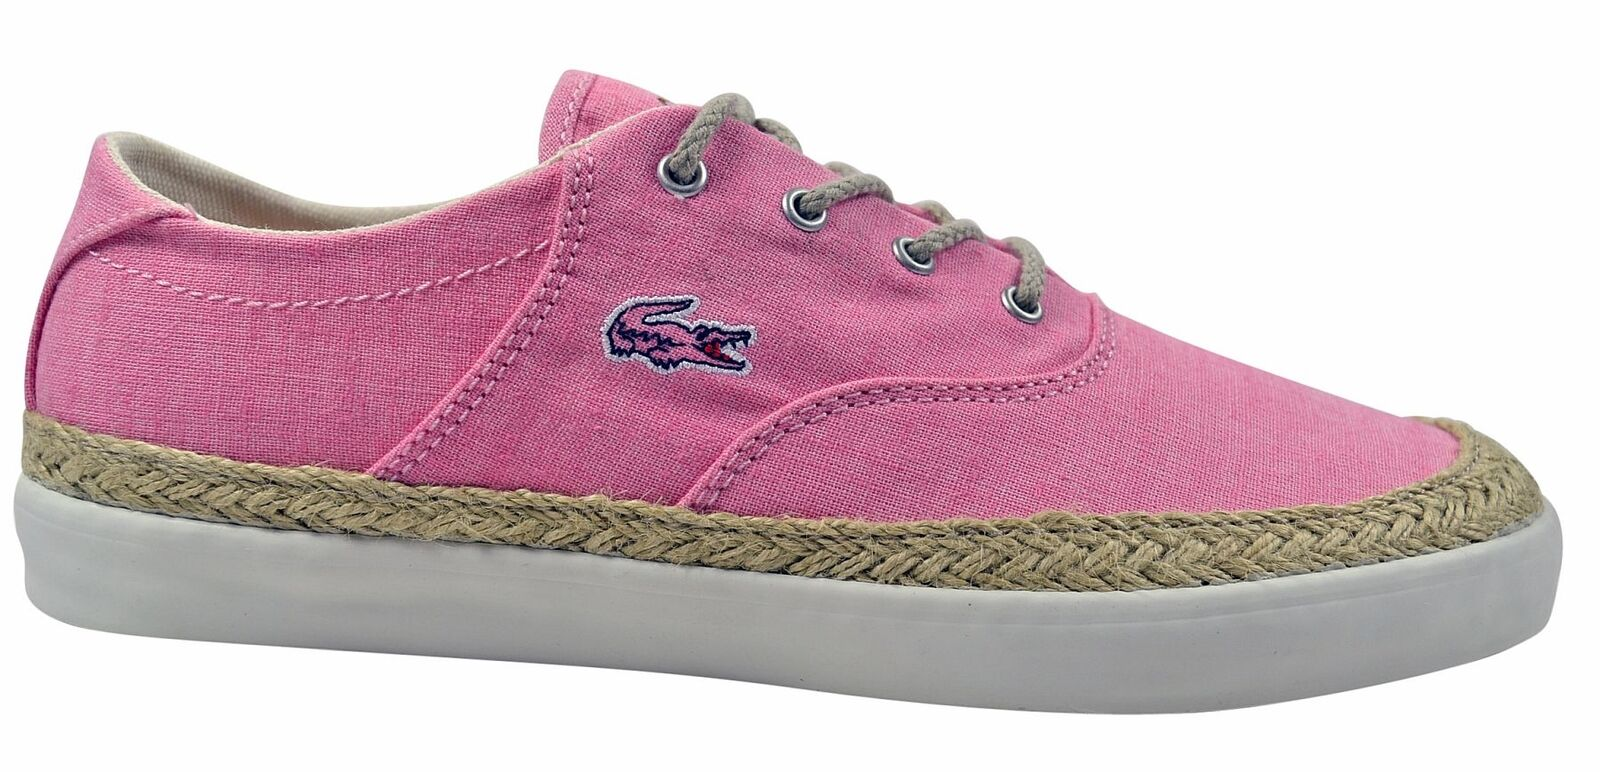 Lacoste Glendon Espa W SRW pink Schuhe Sneaker